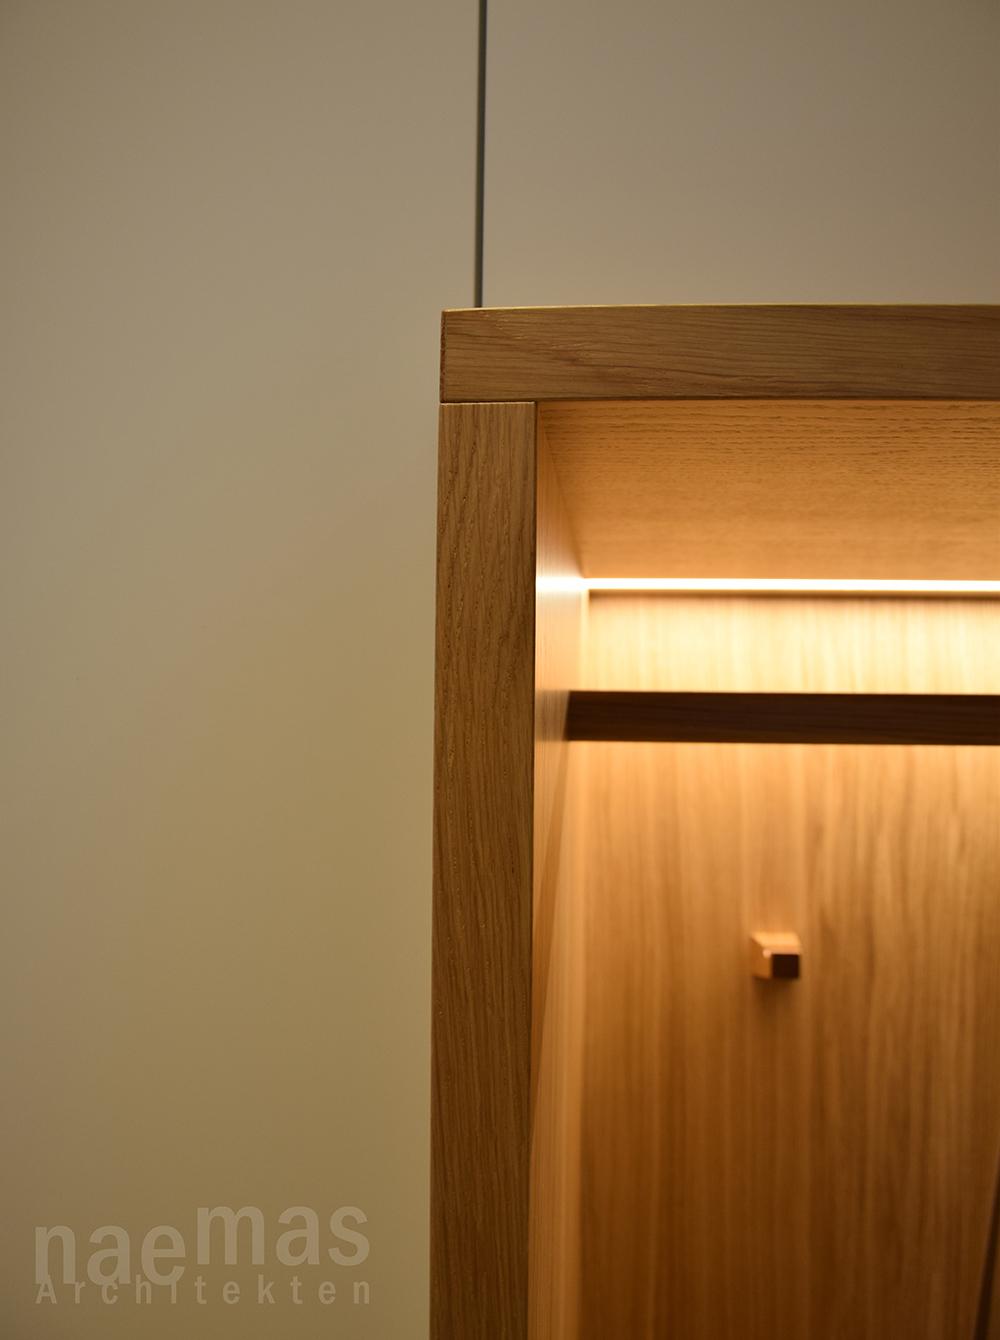 naemas Architekten - FOYER EBA - Lana - Detail Eck